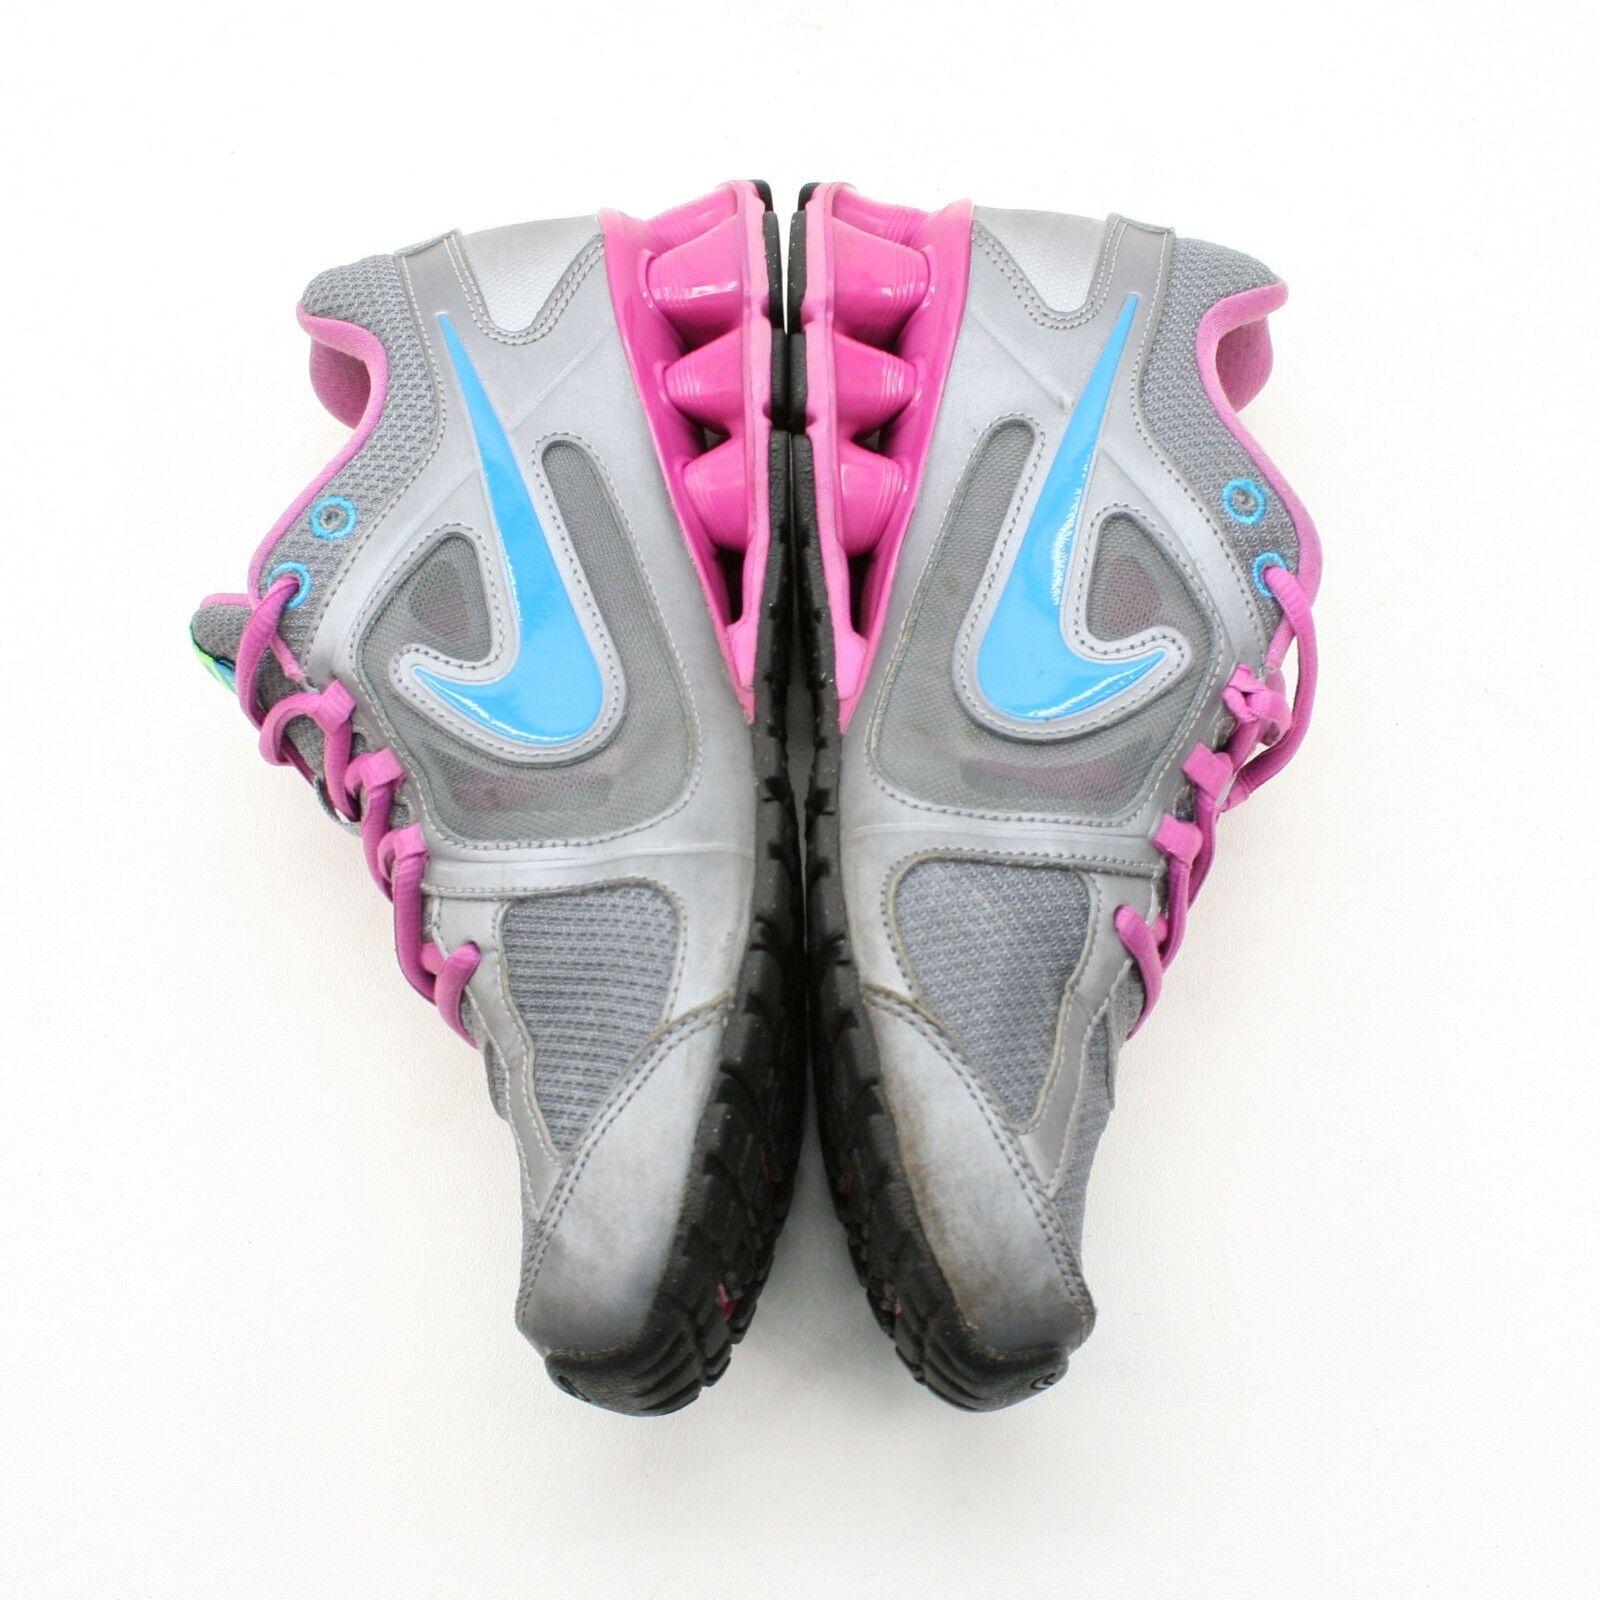 ec984d19849a Nike Ladies 7.5 7.5 7.5 (38.5 EUR) Reax Run 8 Purple Gray Silver ...